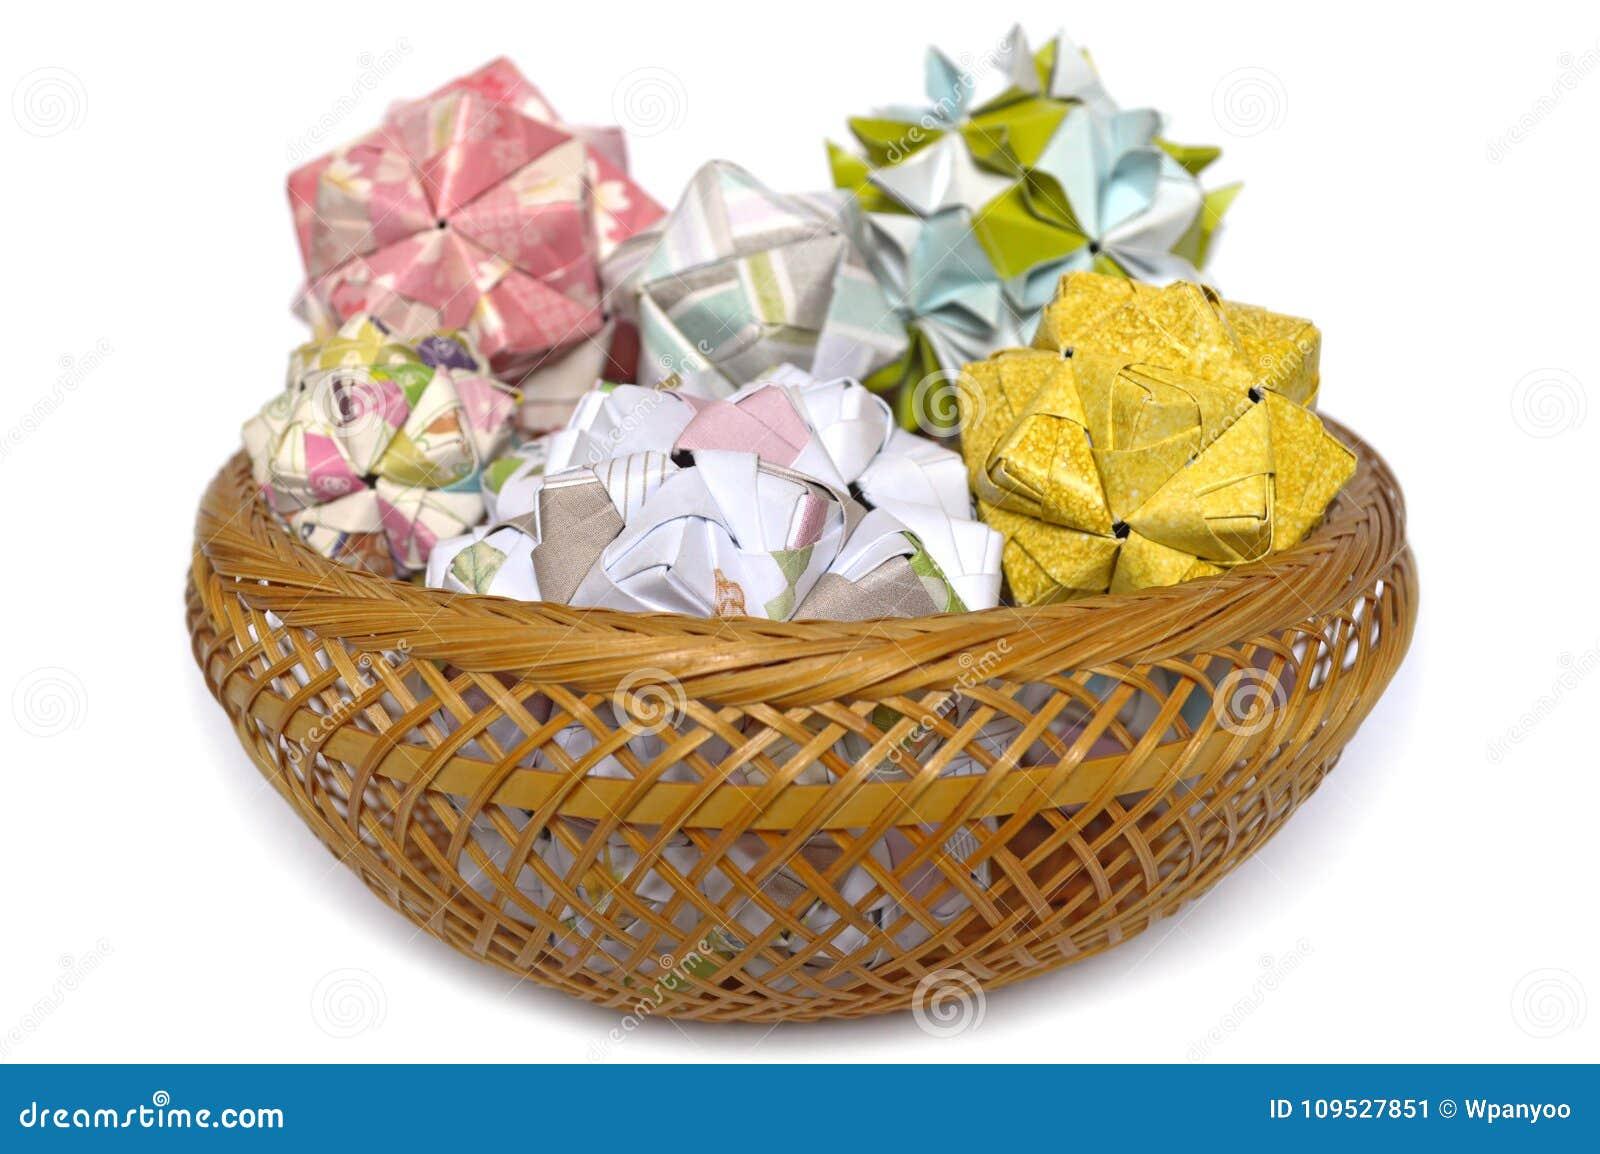 Modular Origami Sonobe Ball And Cherry Blossom Stock Image Image